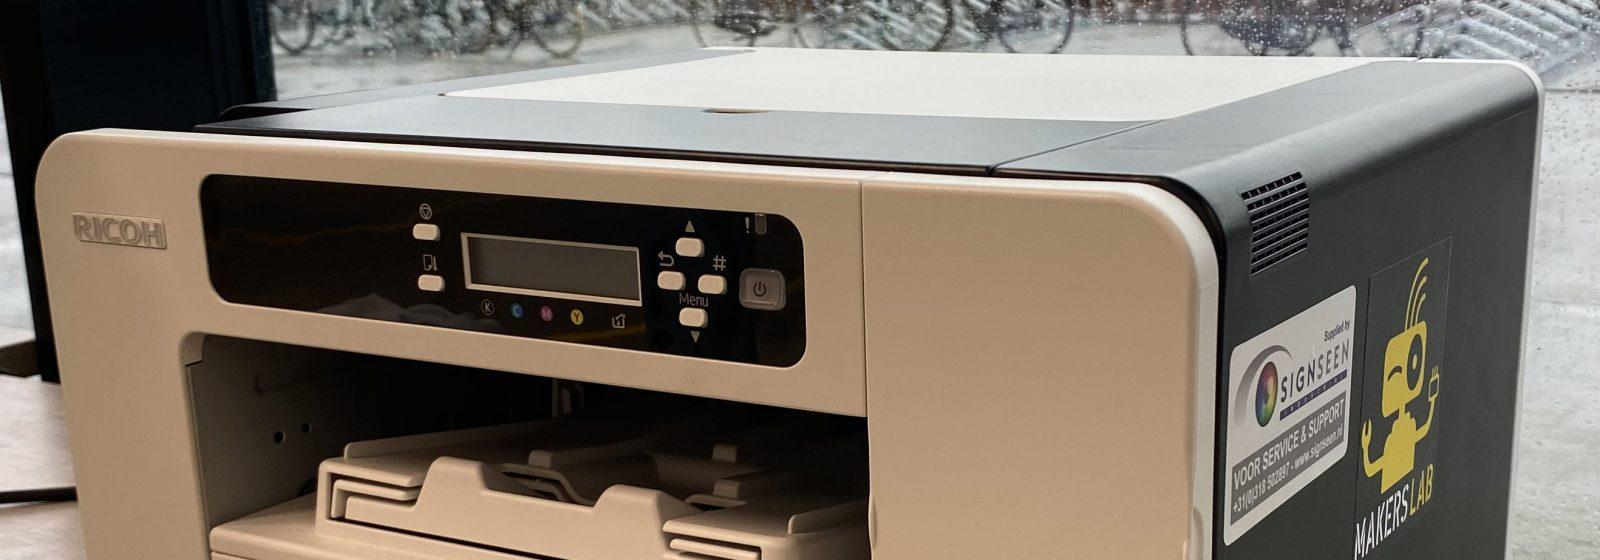 Color printer Ricoh